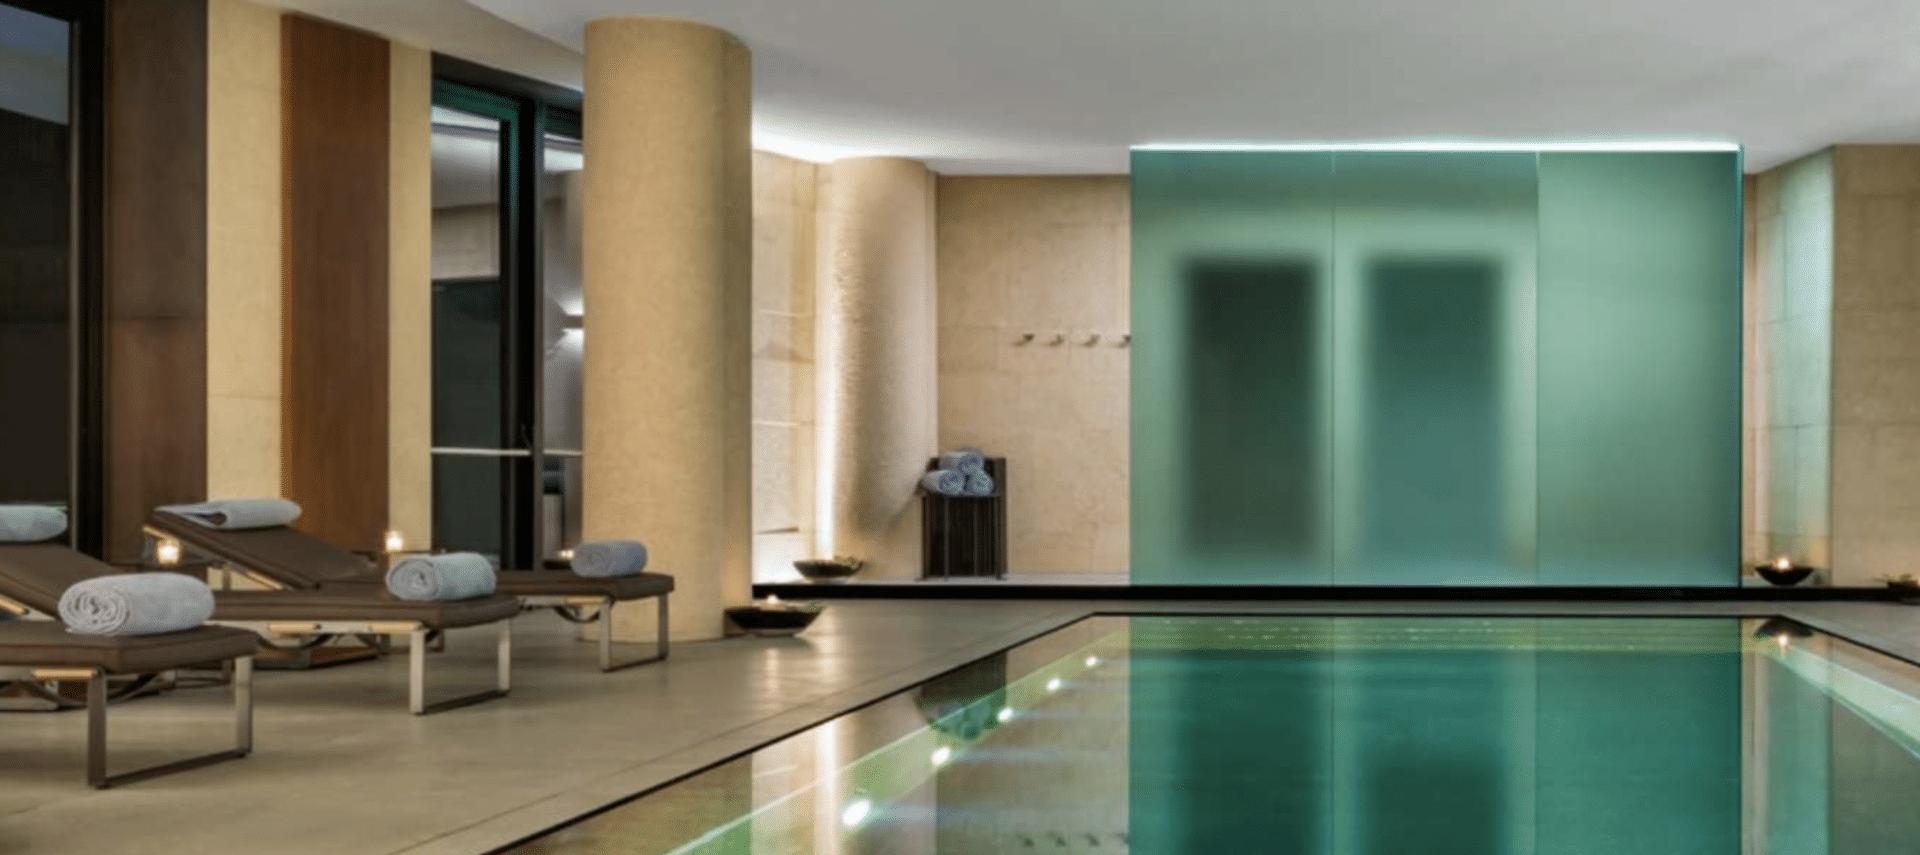 Hotel Mailand